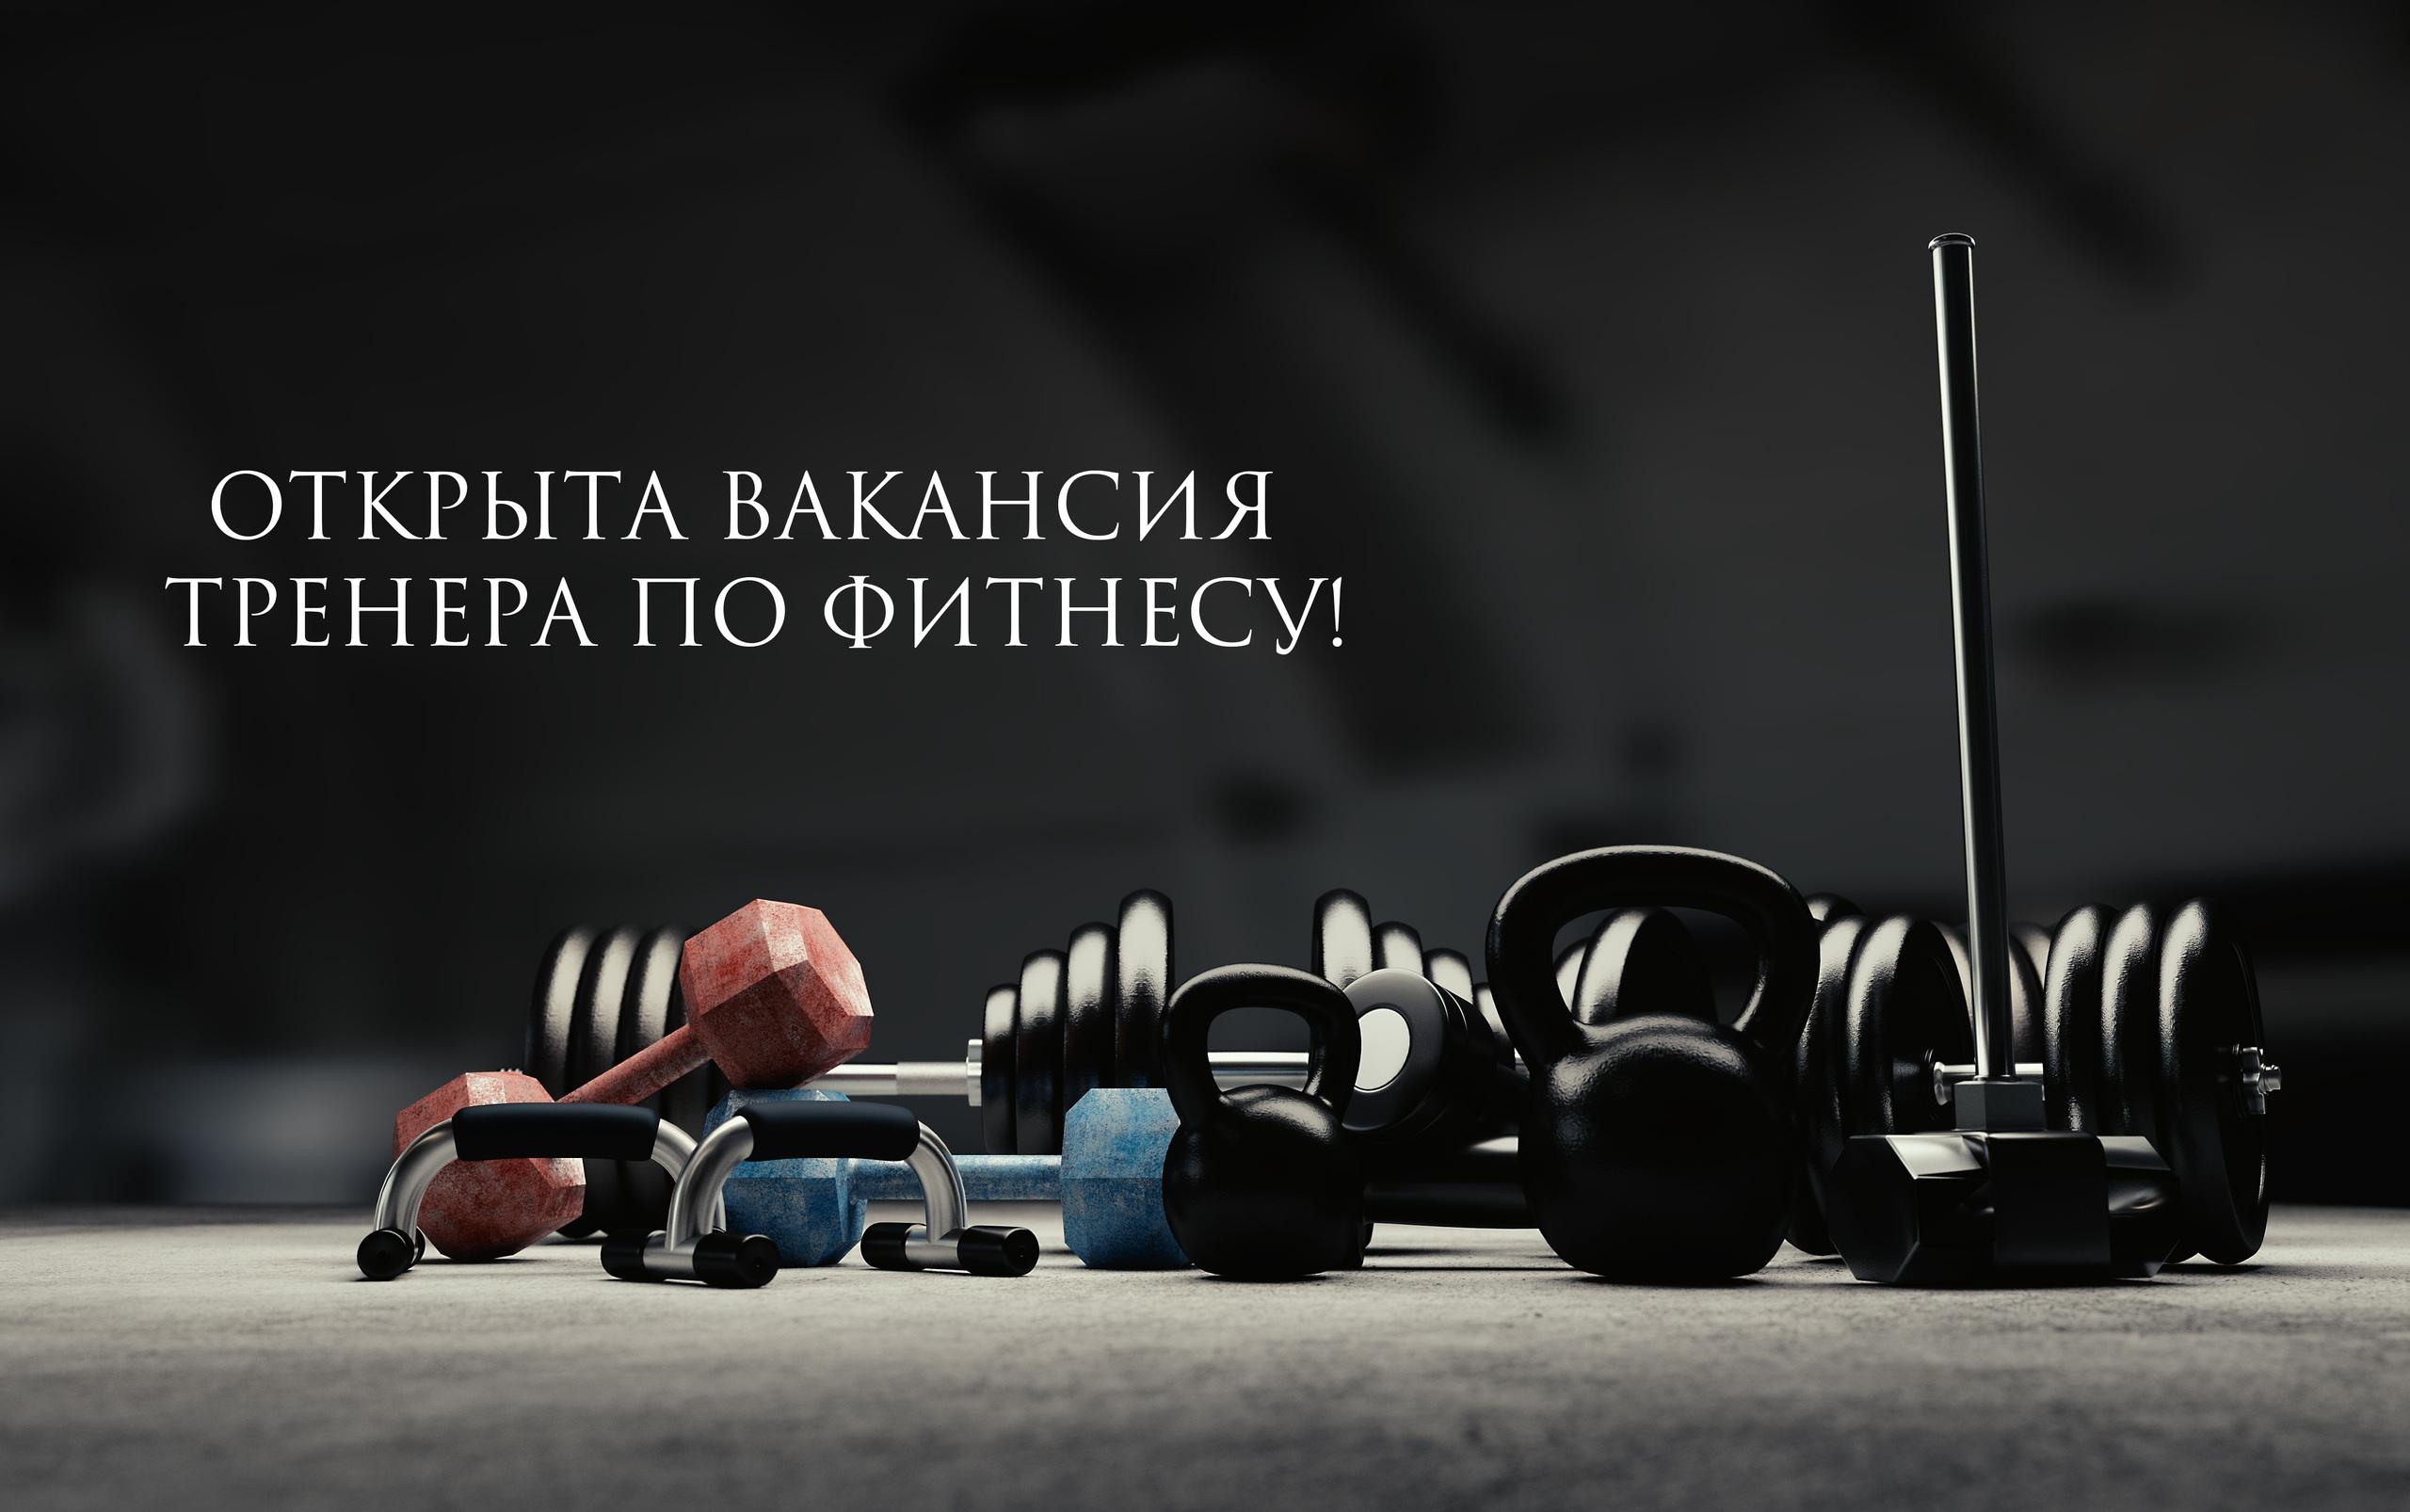 ОТКРЫТА ВАКАНСИЯ ТРЕНЕРА ПО ФИТНЕСУ